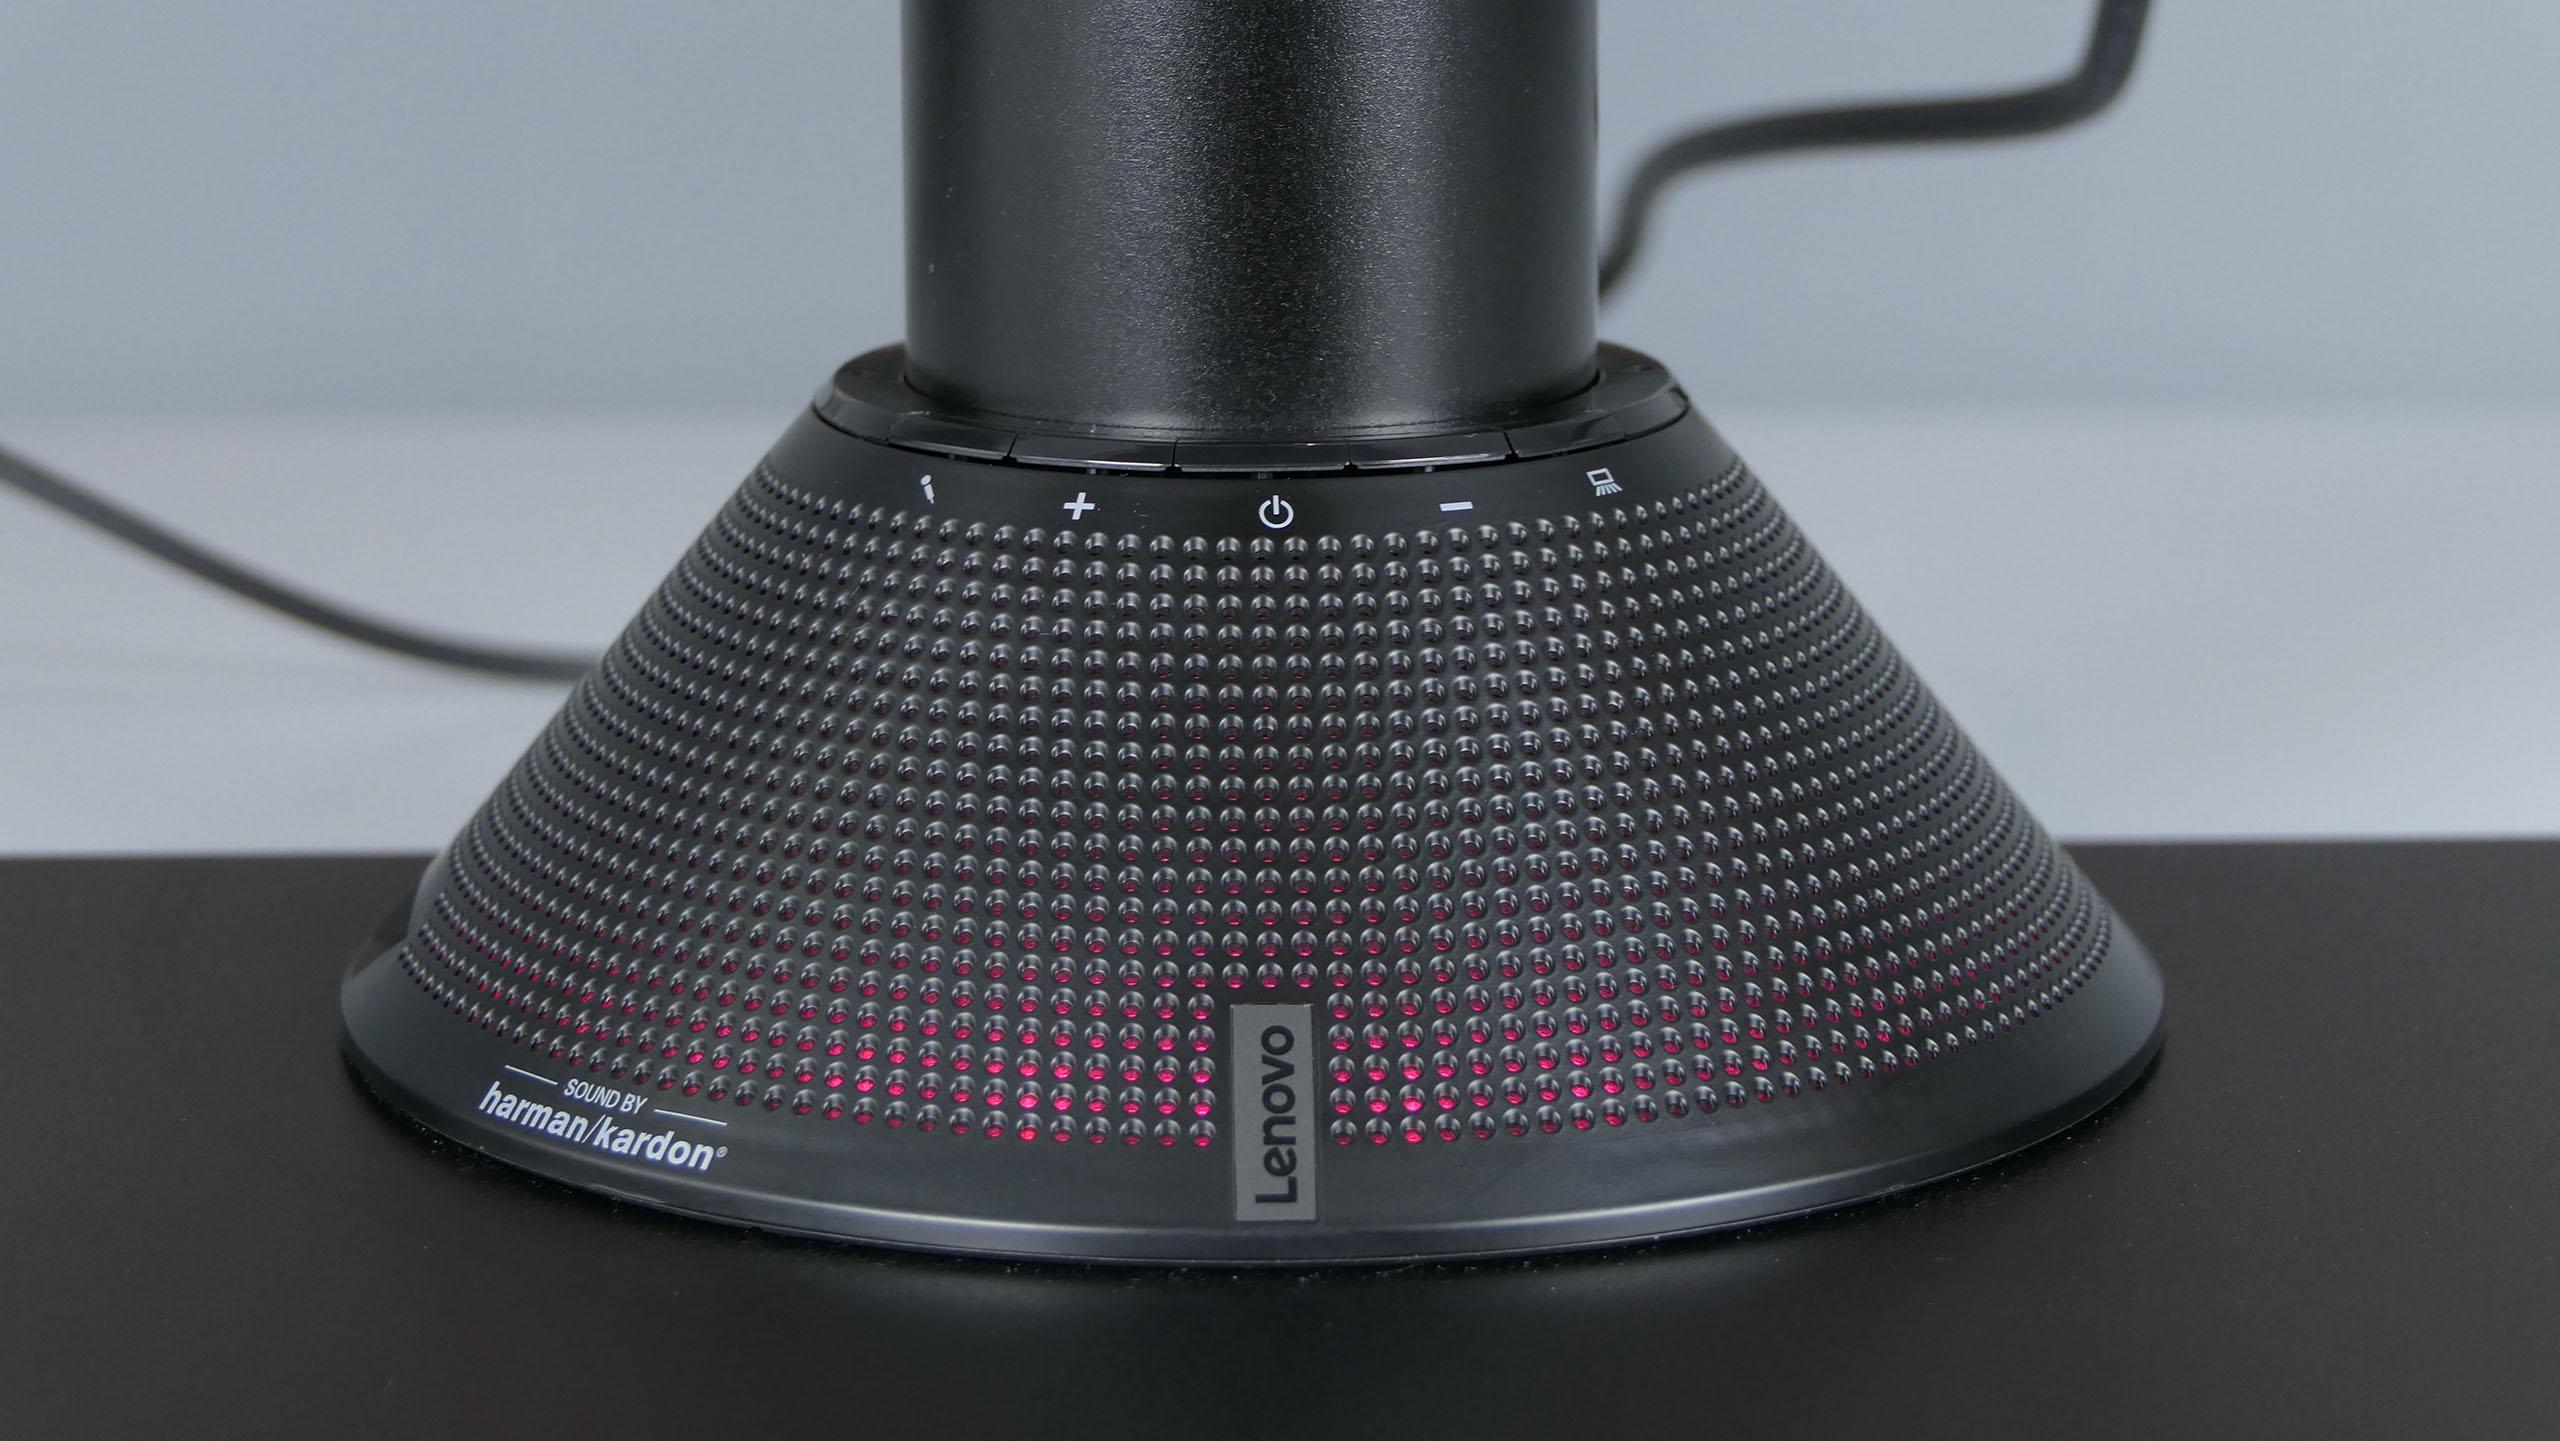 Lenovo ThinkVision P44w - głośnik harman/kardon